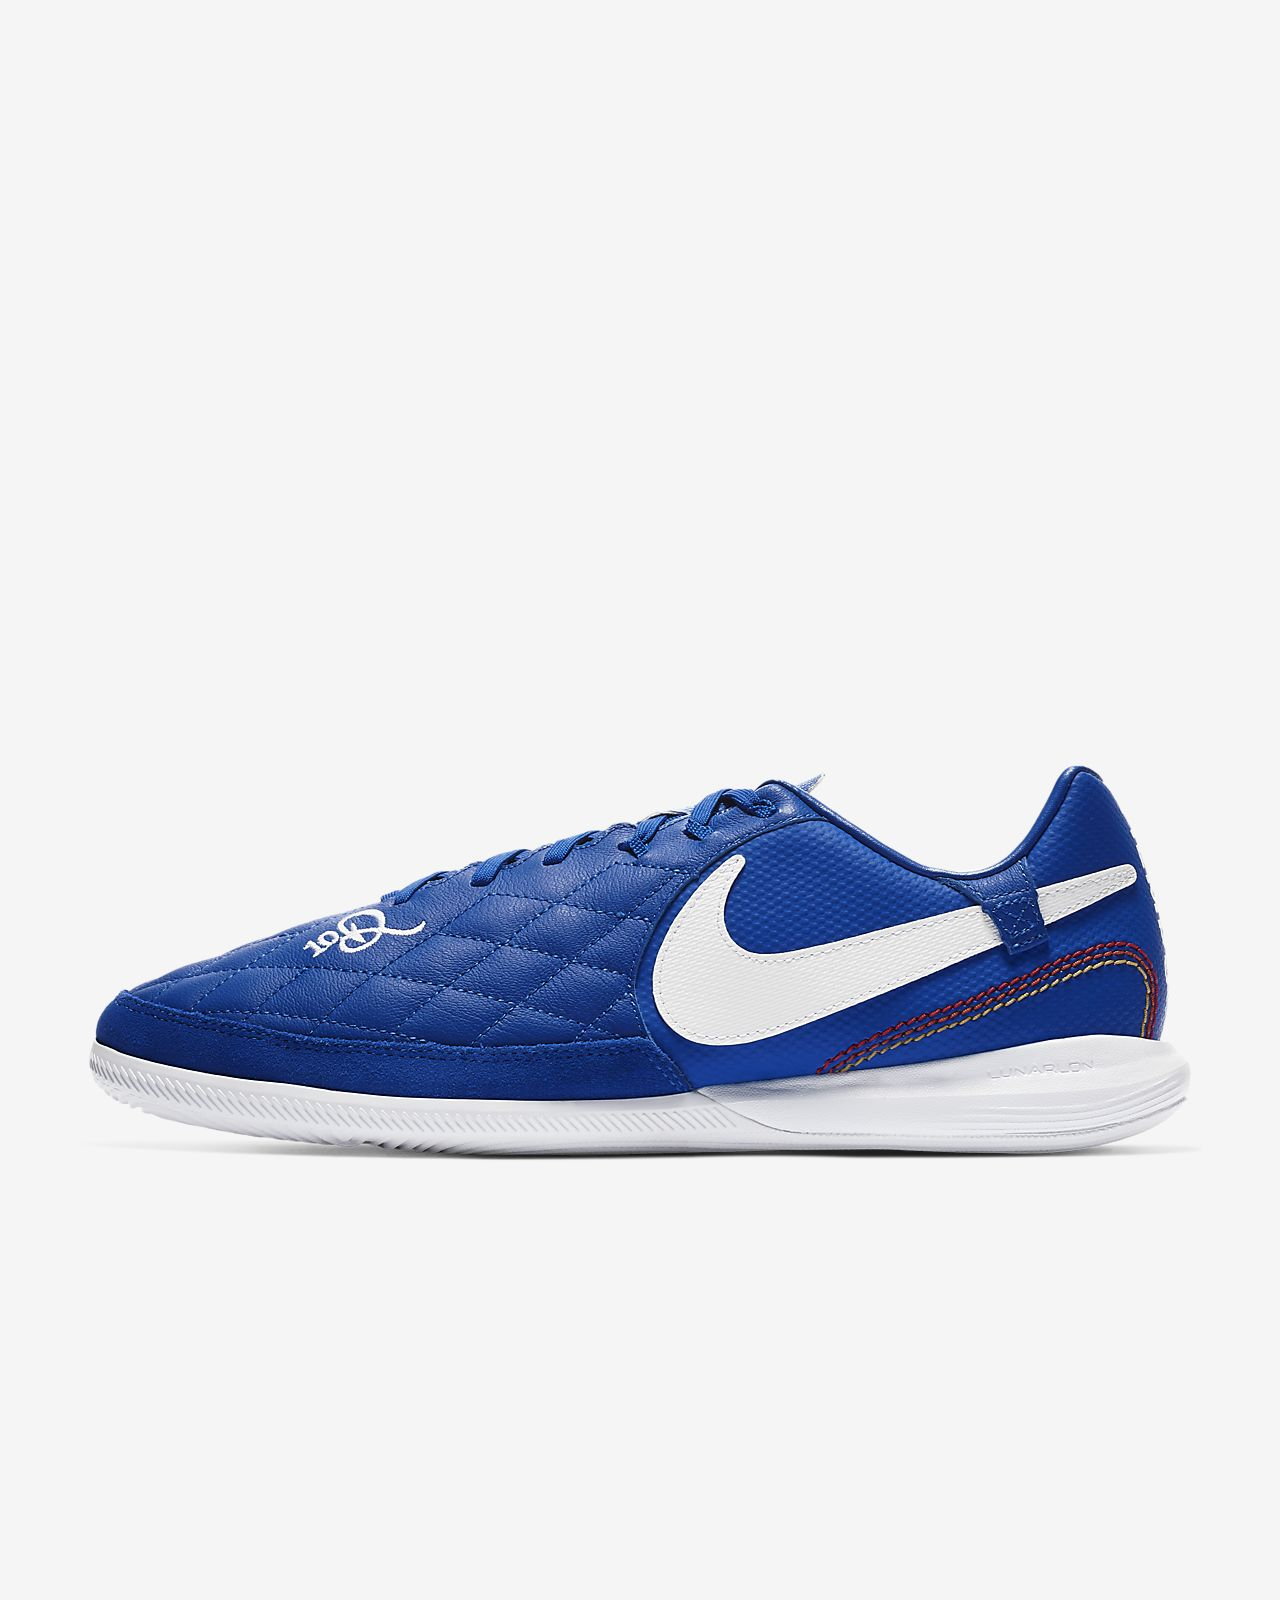 Sapatilhas de futsal Nike TiempoX Lunar Legend VII Pro 10R